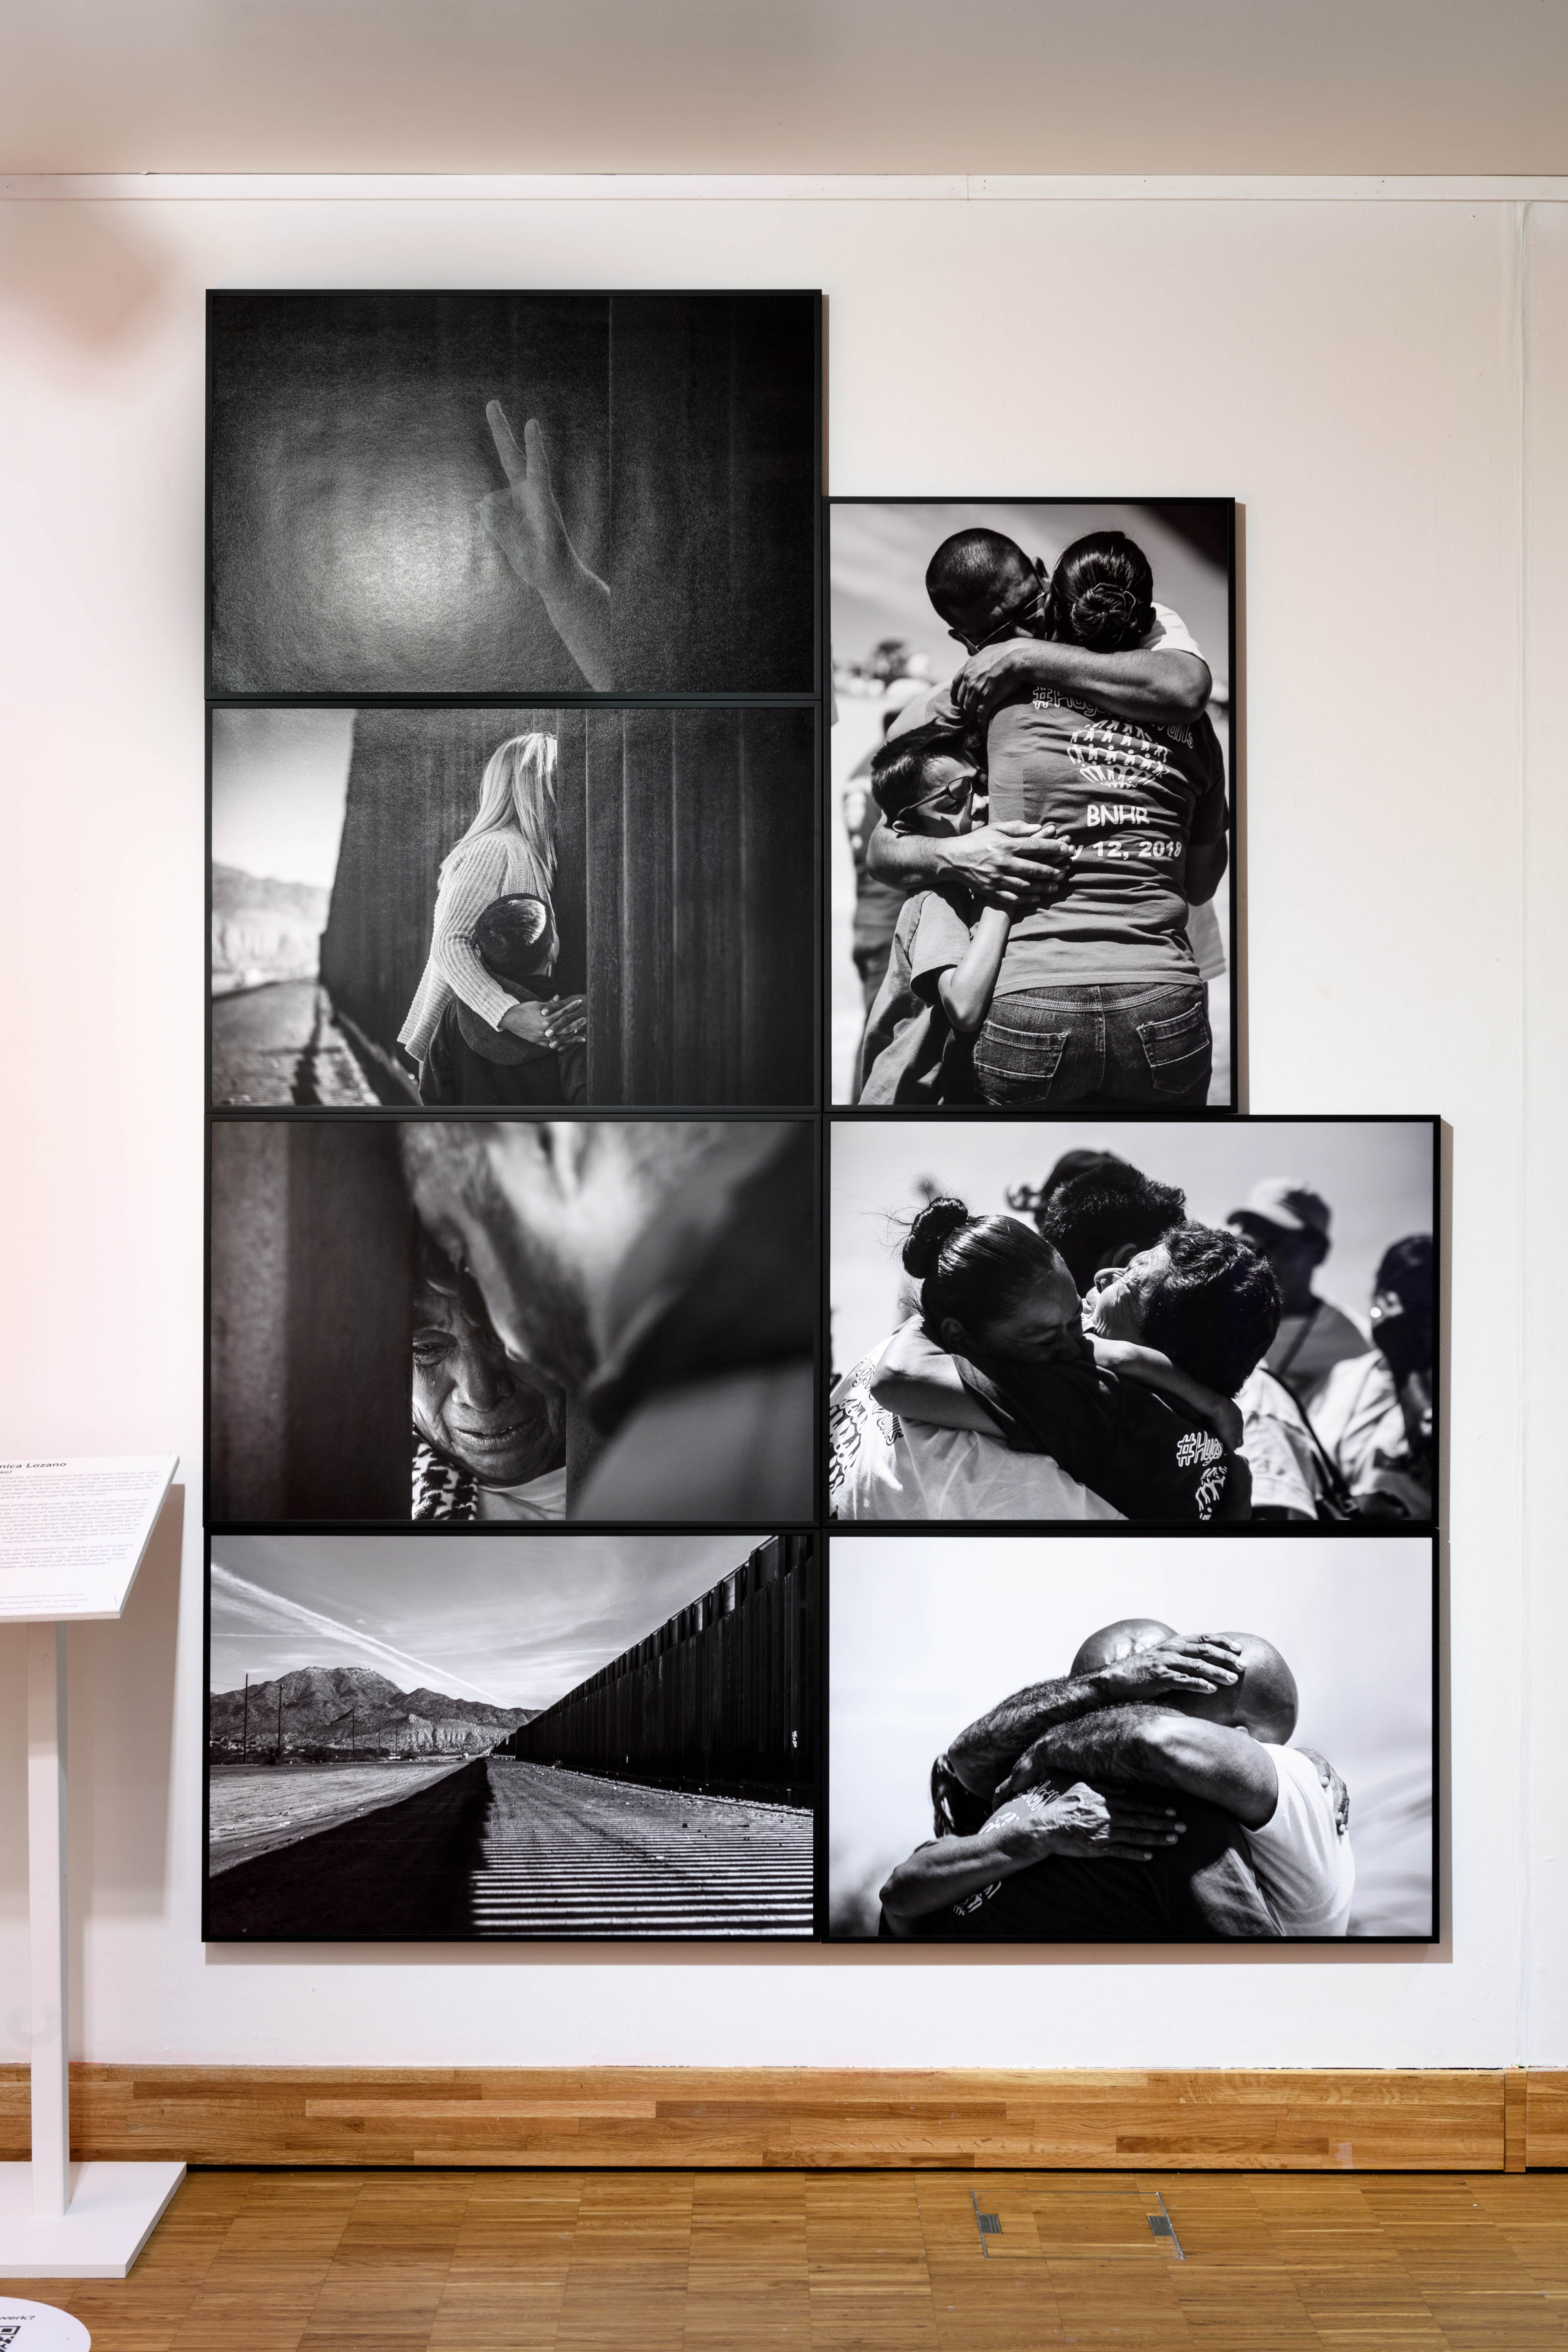 Monica Lozano, Hugs not Walls, 2018, Photo Mike Bink for Kunsthal KAdE.jpg